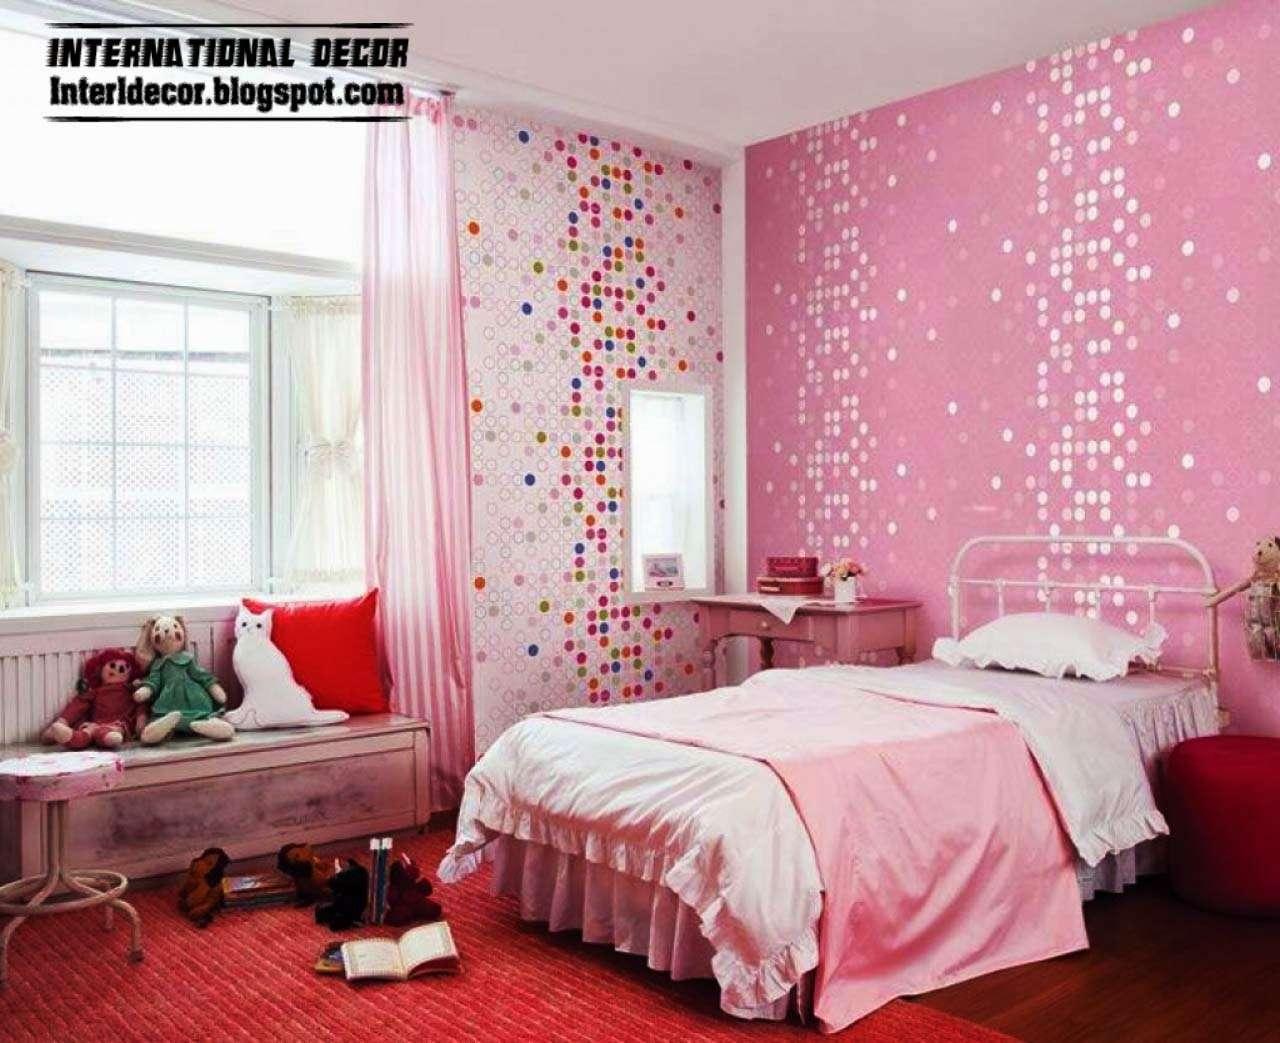 Girls Bedroom Ideas Modern Room Pink Luxury